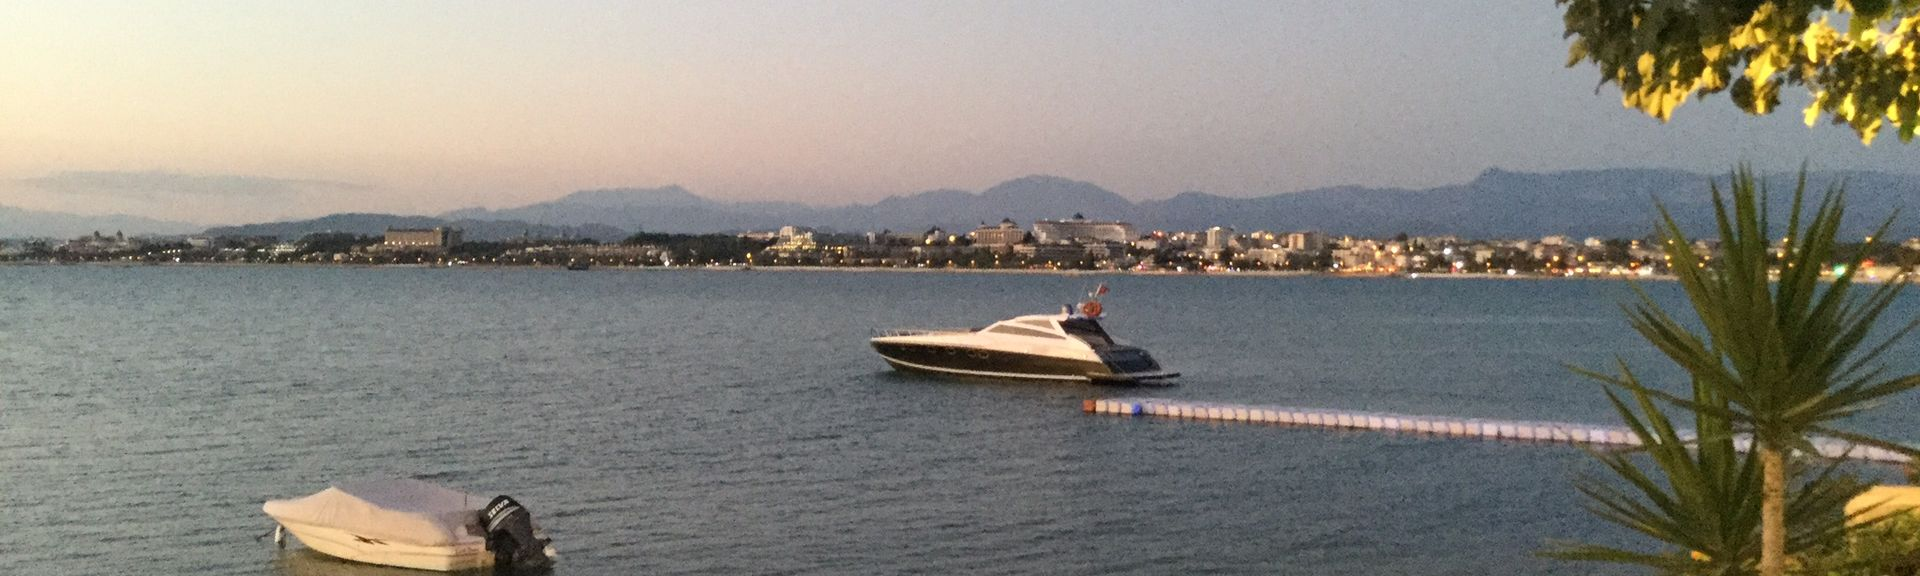 Evrenseki, Side, Antalya (alue), Turkki